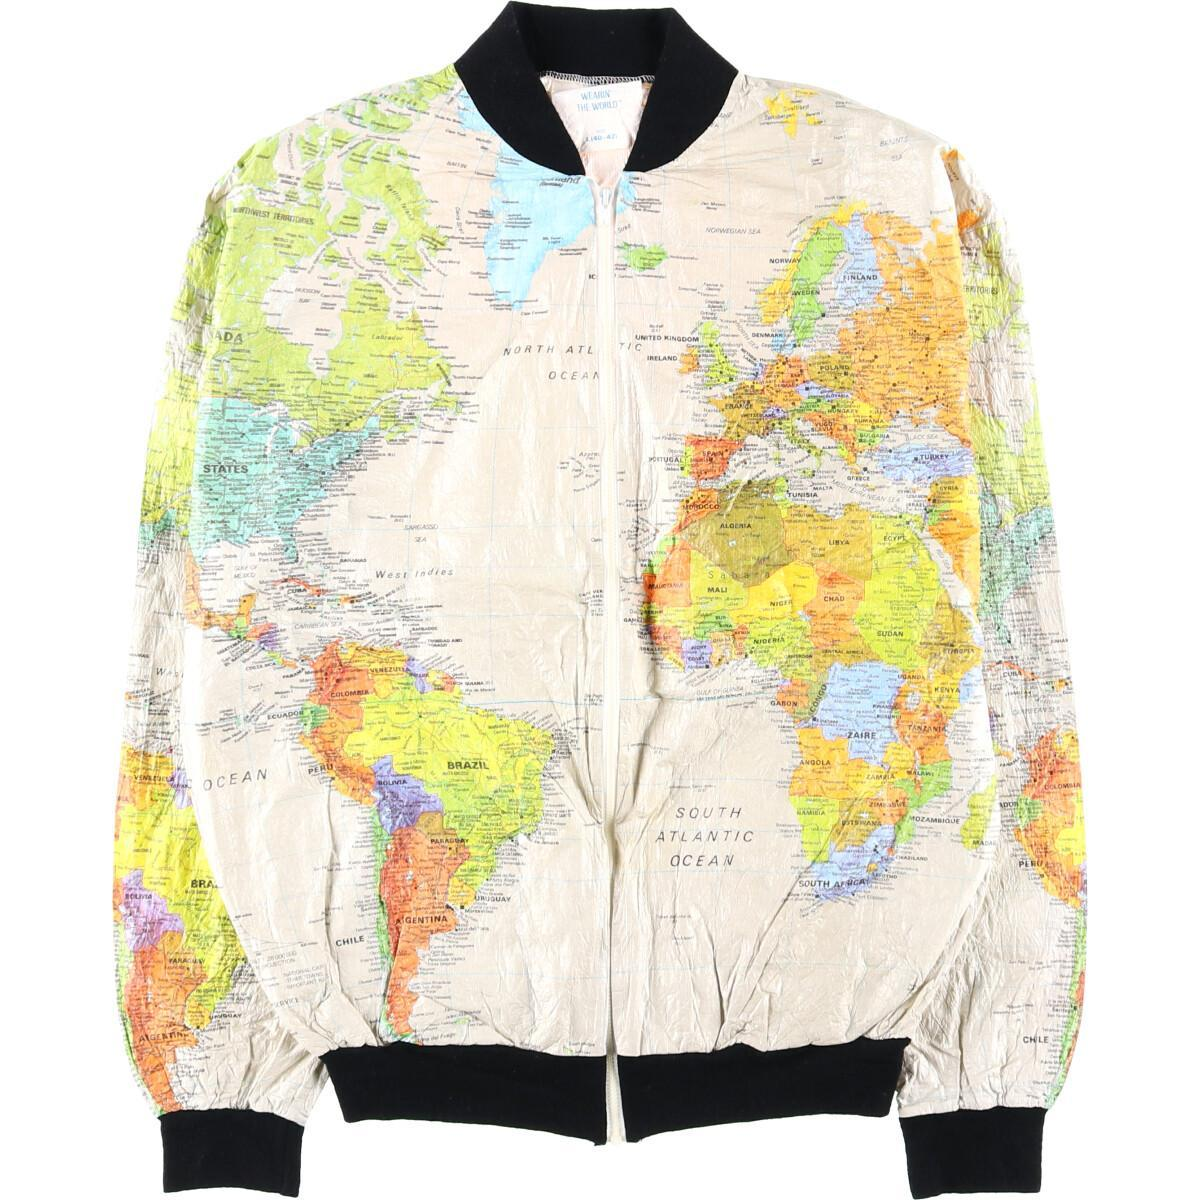 WEARIN' THE WORLD 地図柄 ペーパージャケット メンズM ヴィンテージ /eaa002826 【中古】 【200130】